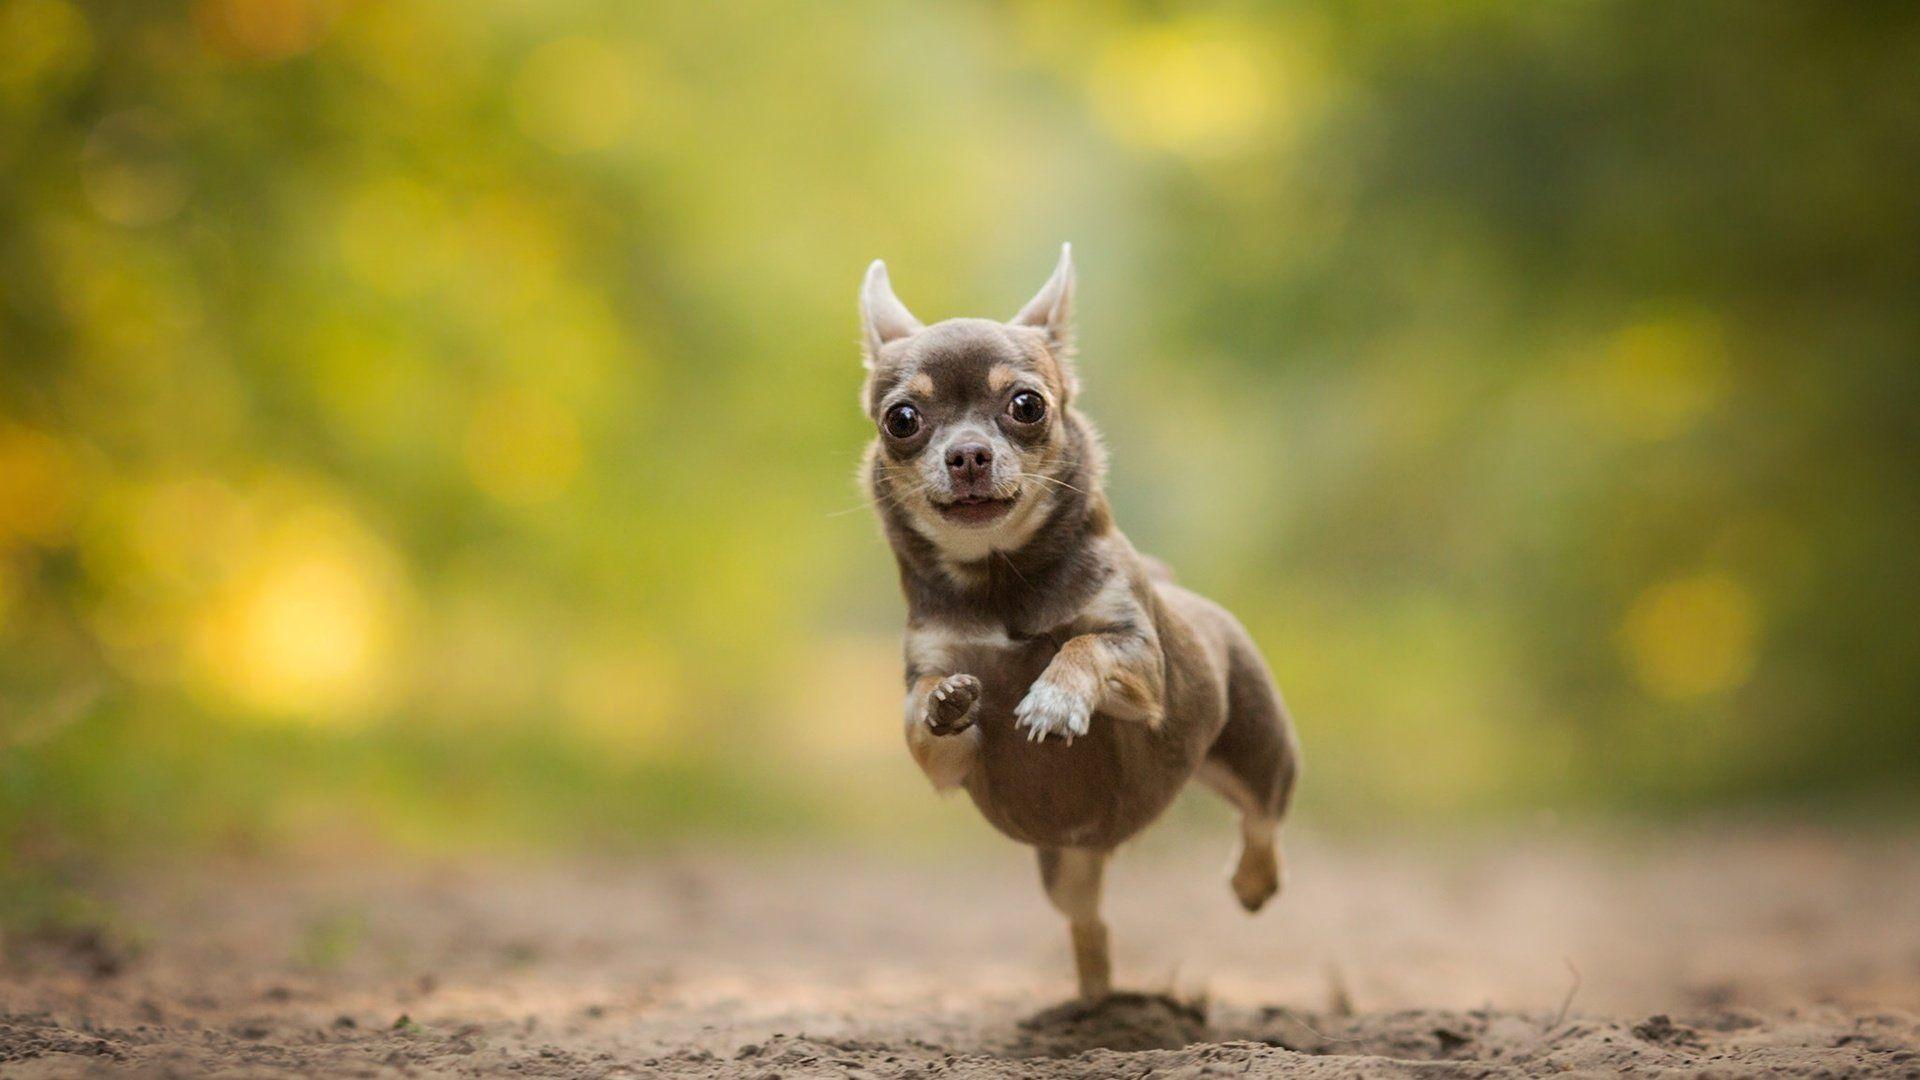 Running An Evil Chihuahua